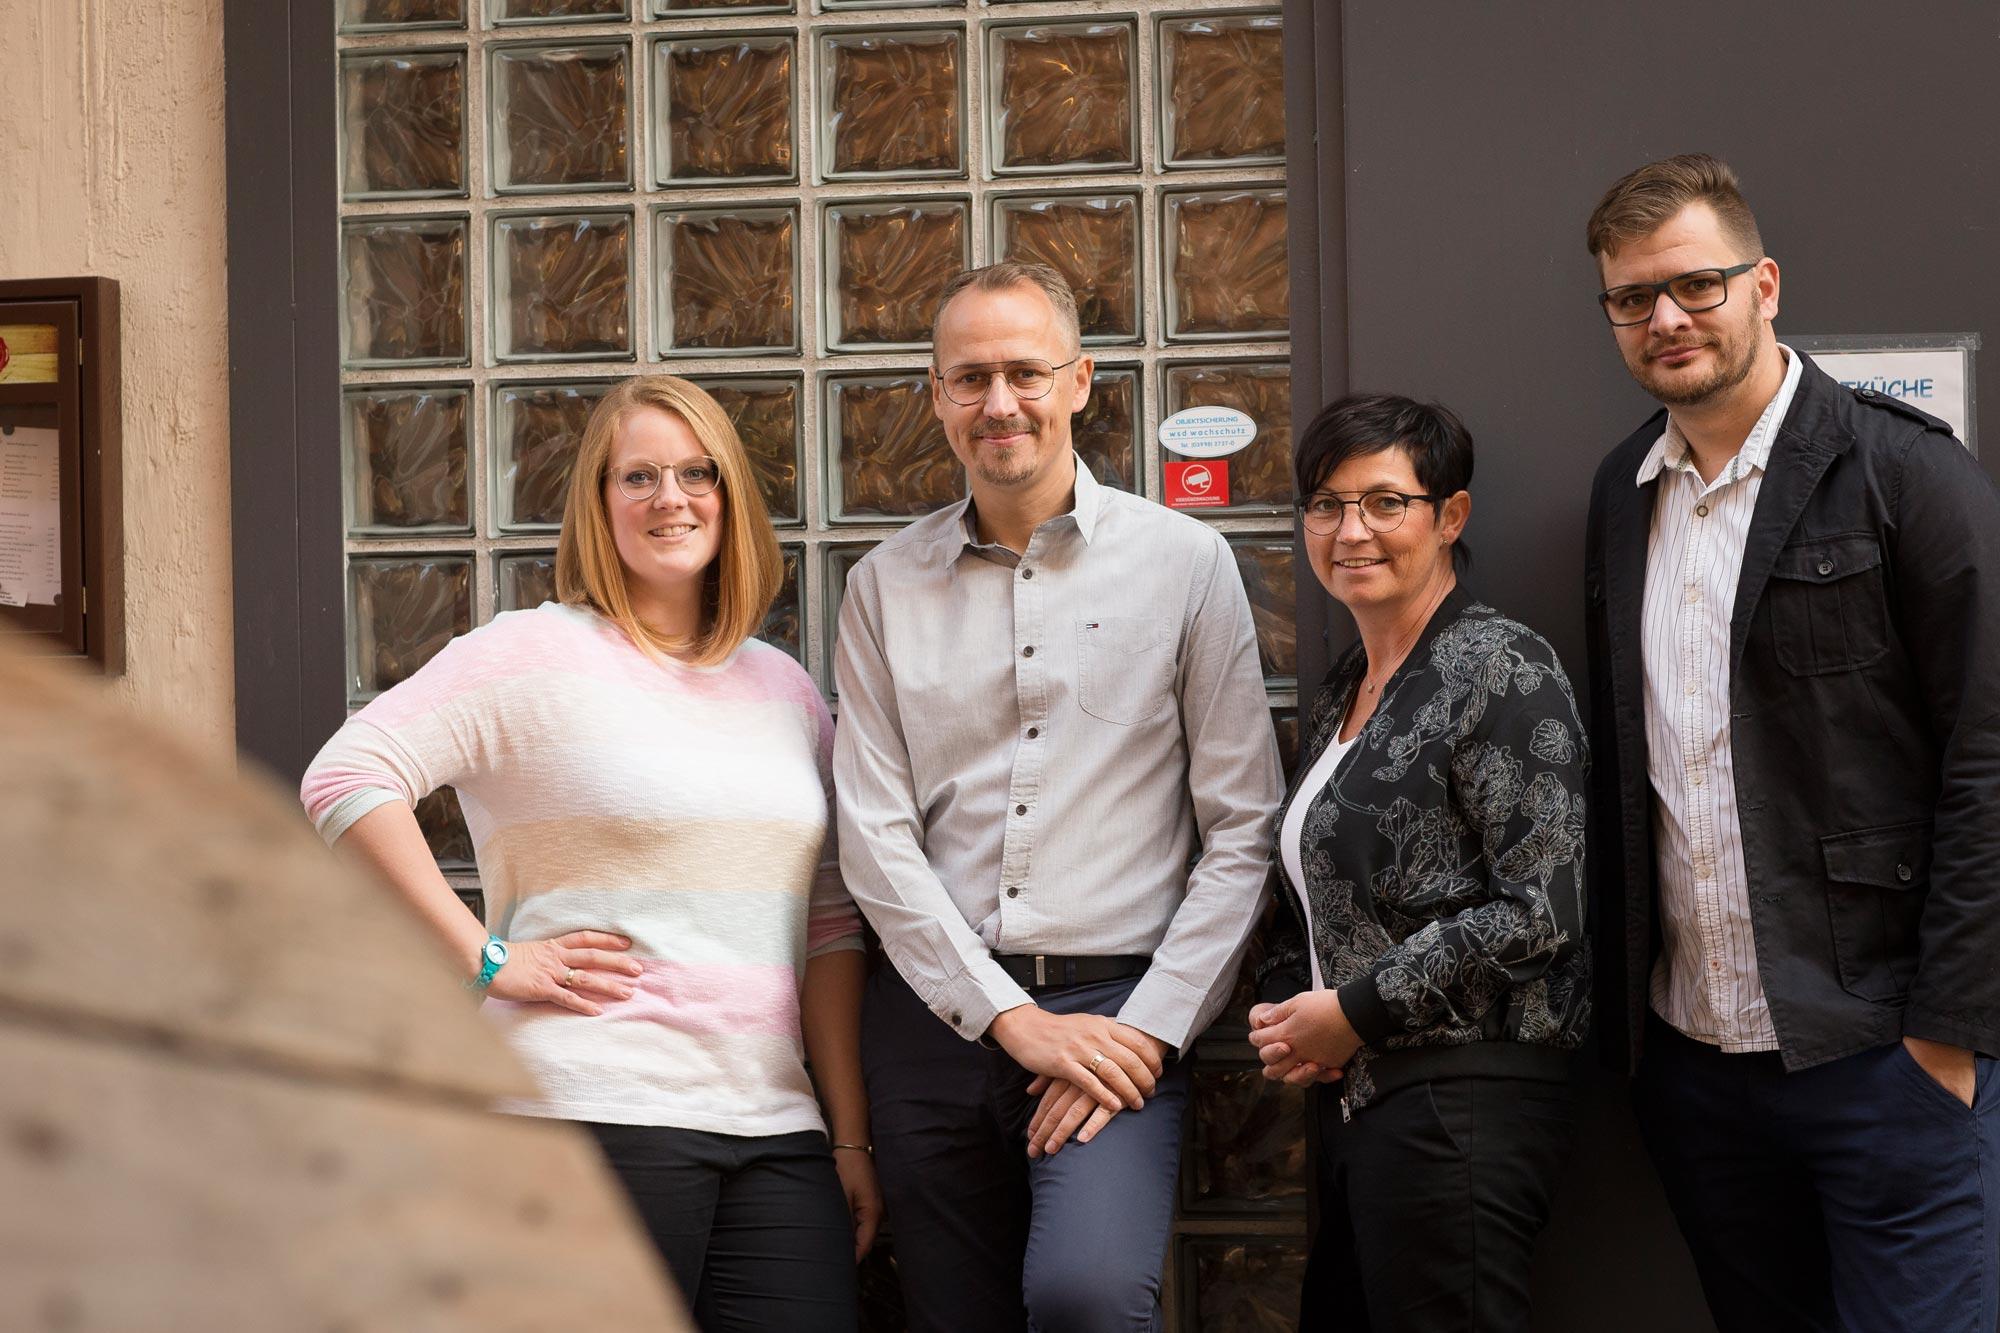 Michaela Greve, Matthias Sagawe, Sibylle Weinaug und Andreas Techow von Optik Sagawe in Rostock haben Freude am Sehen